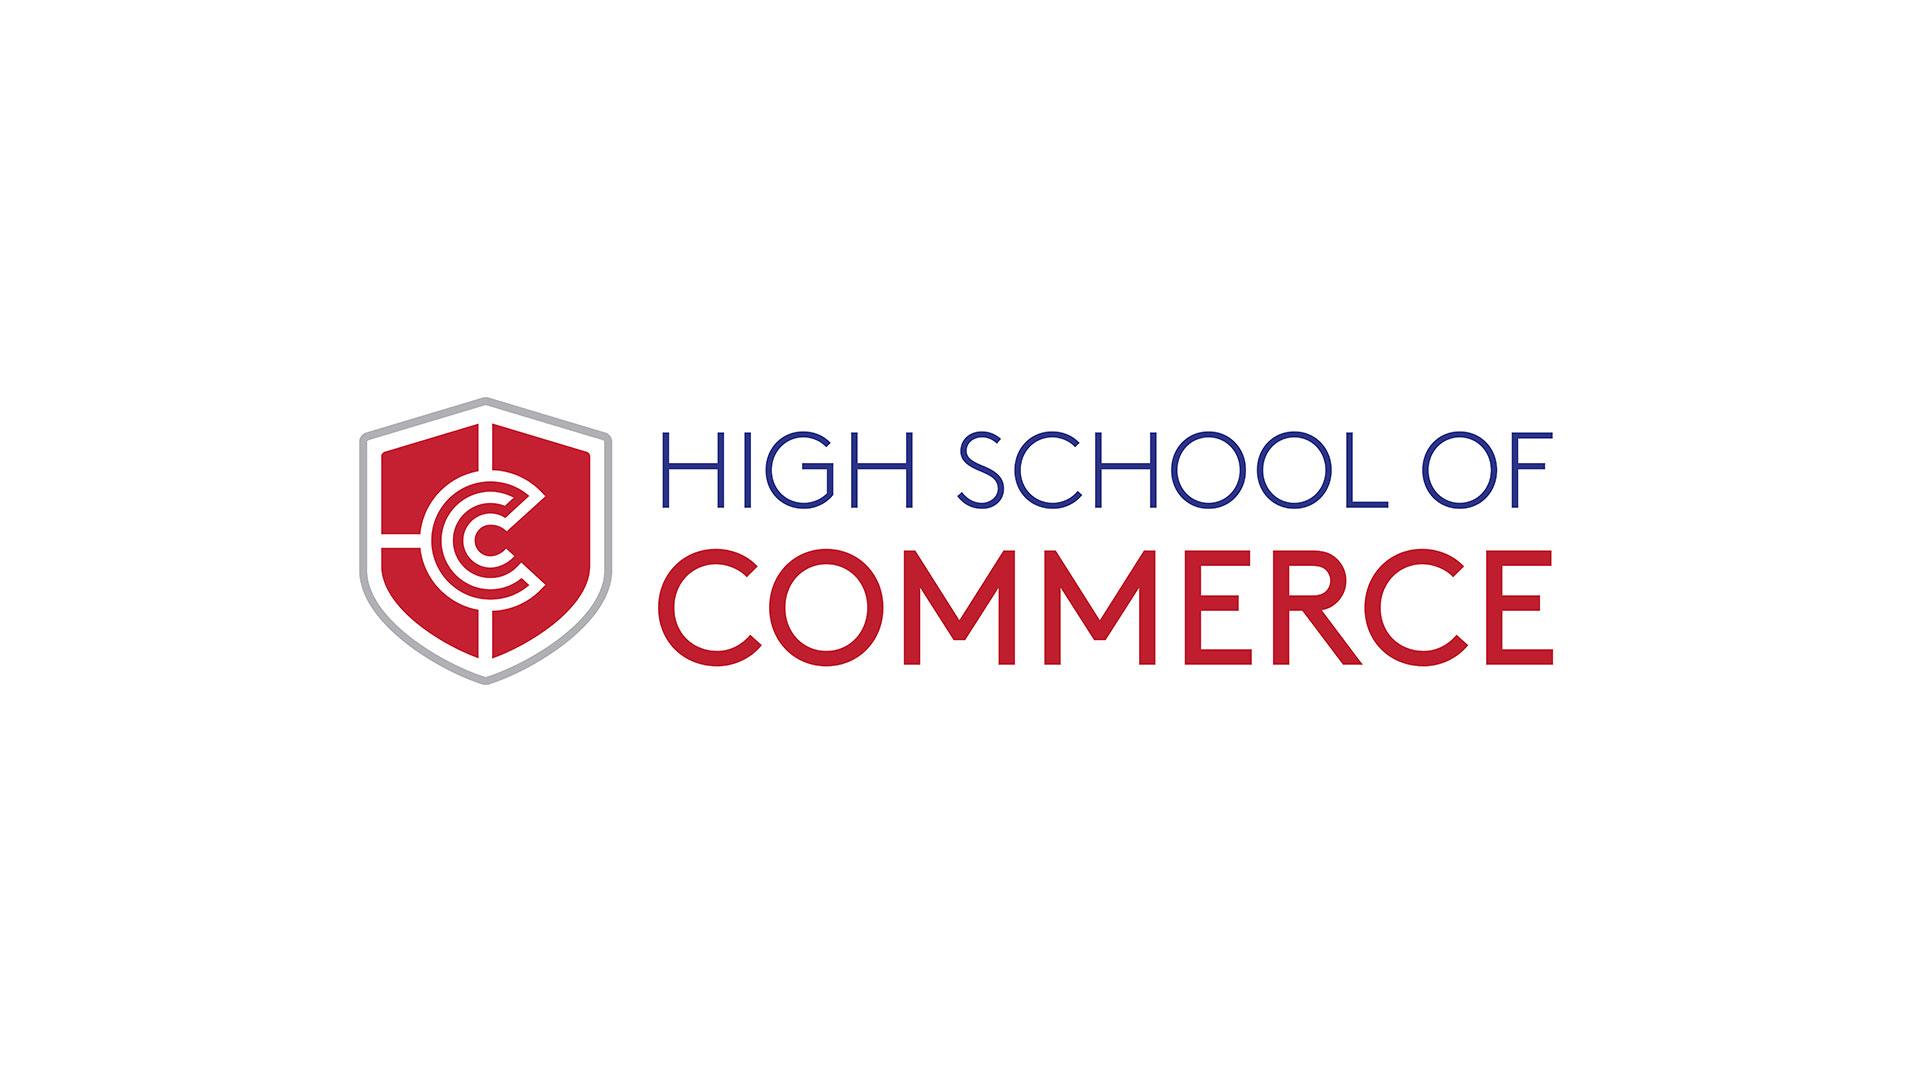 HighSchoolCommerceLogoDesign